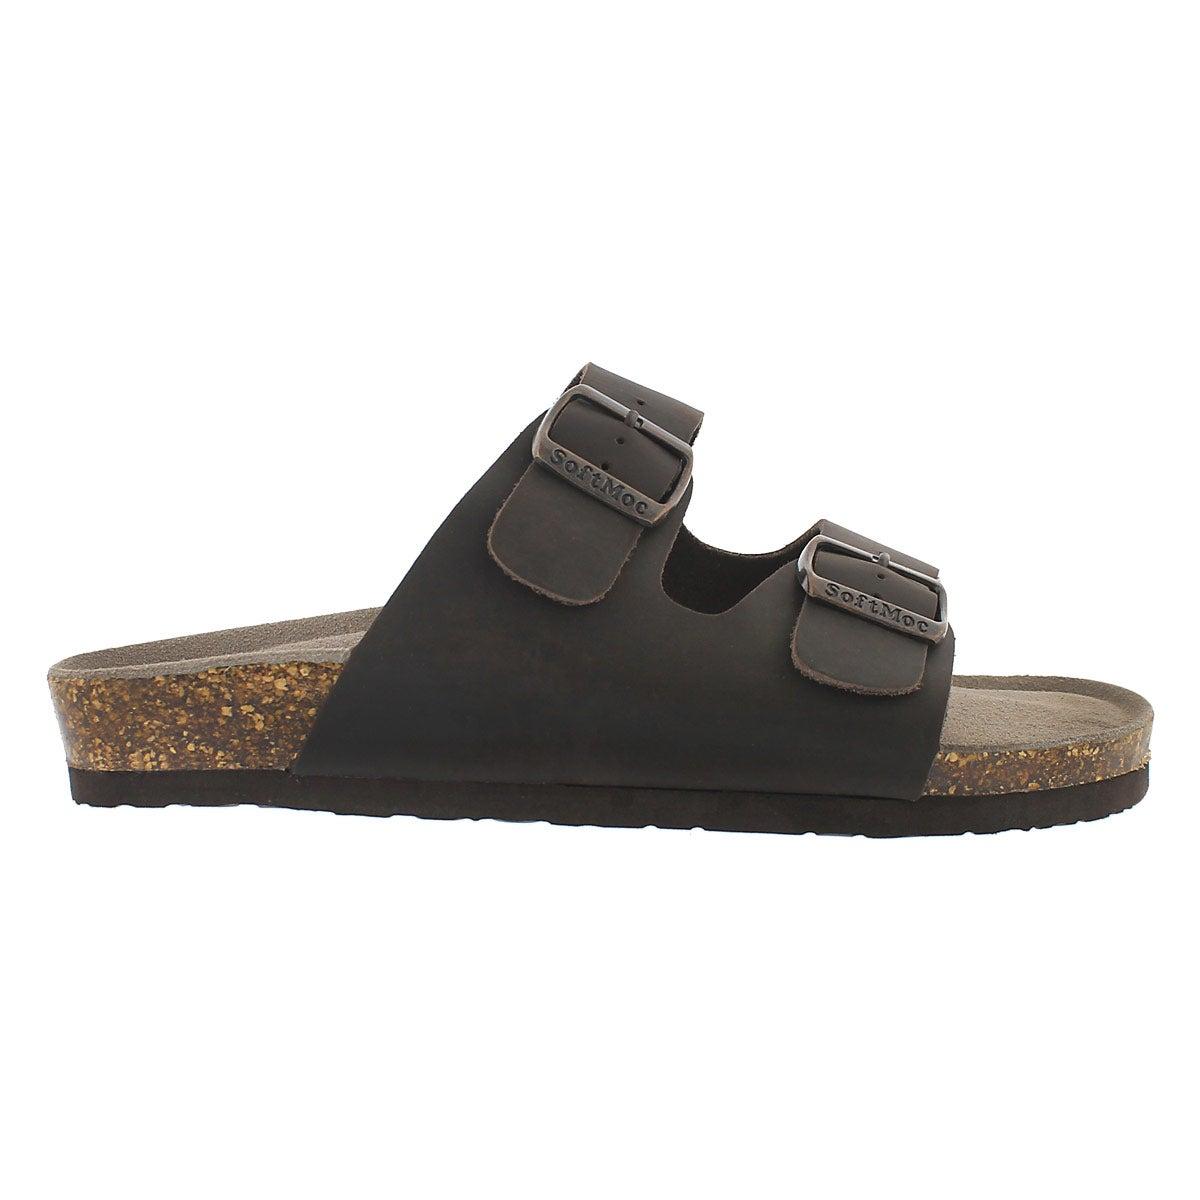 Mns Randy 3 crz brn memory slide sandal